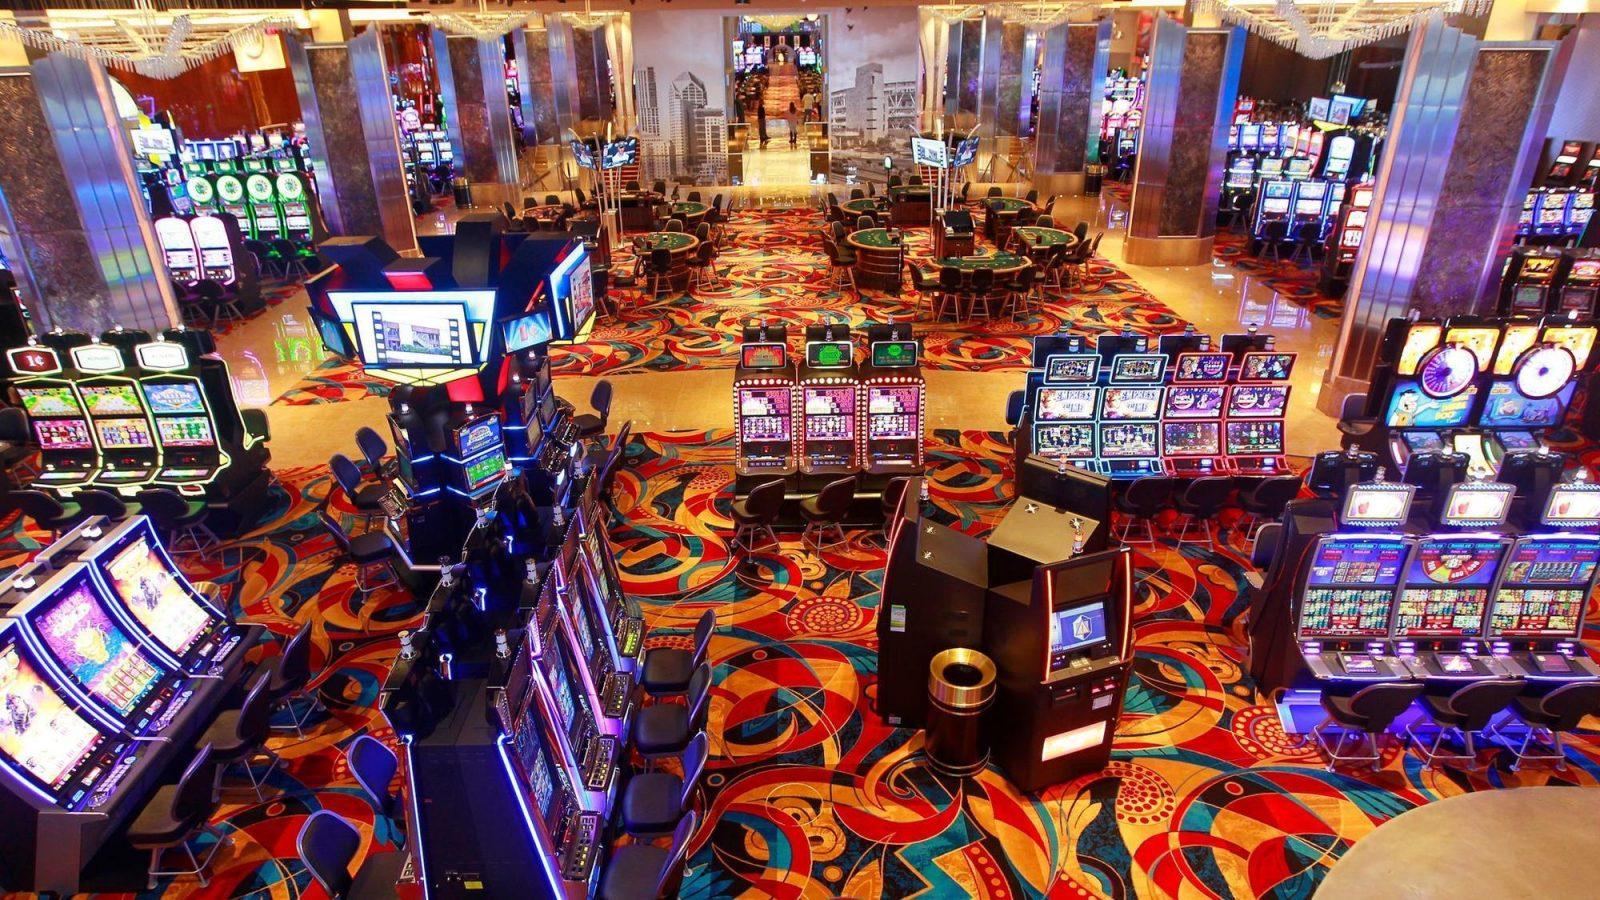 Casino as Authorities jackpot?